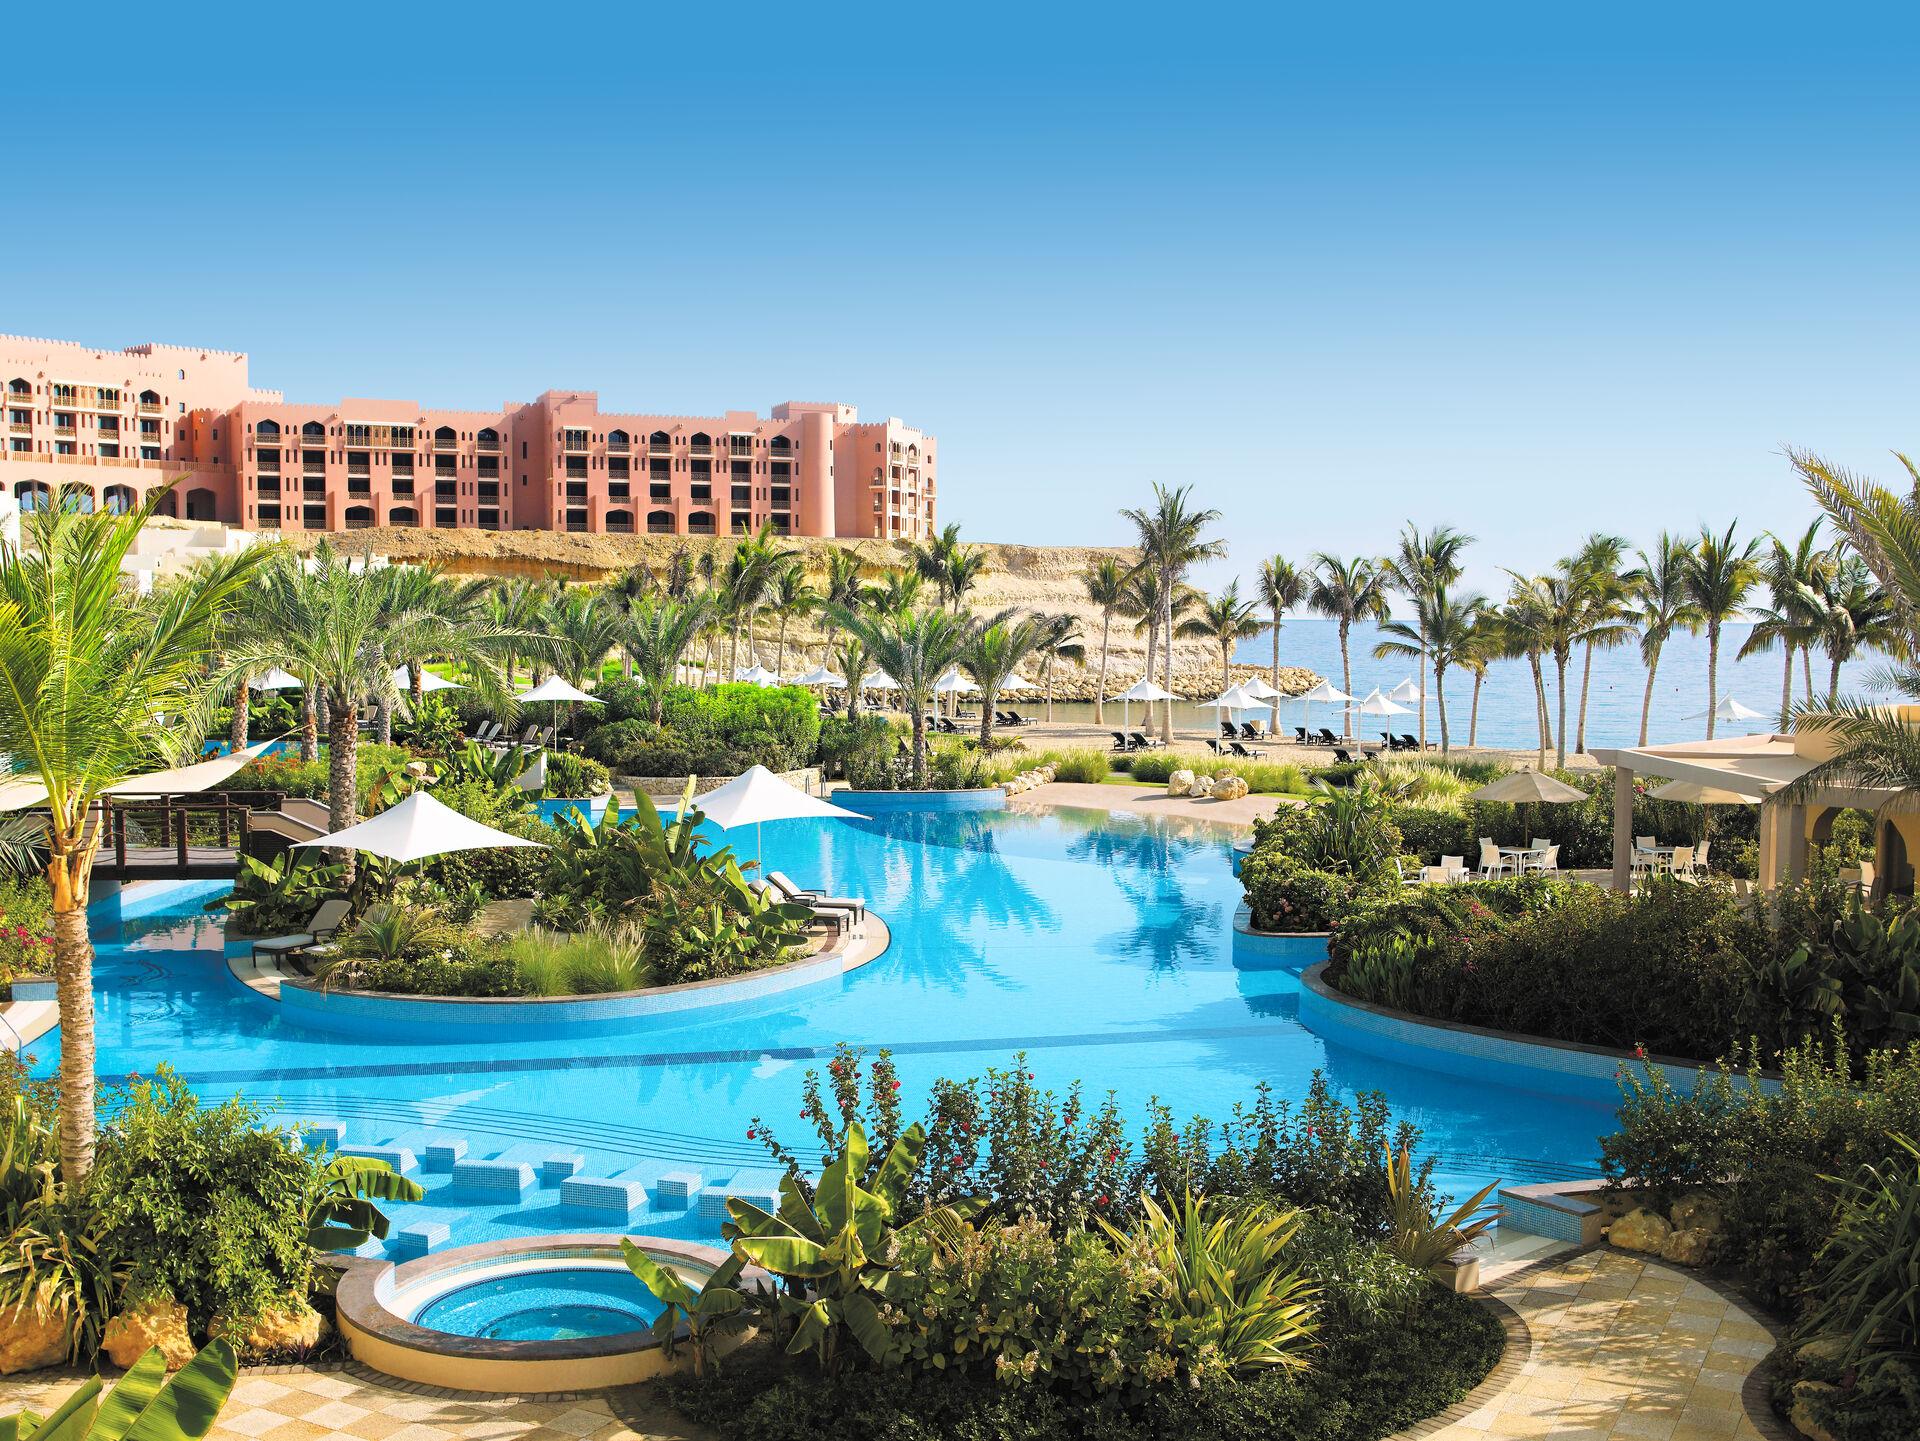 Shangri-La Barr Al Jissah Resort & Spa - Al Bandar - 5*